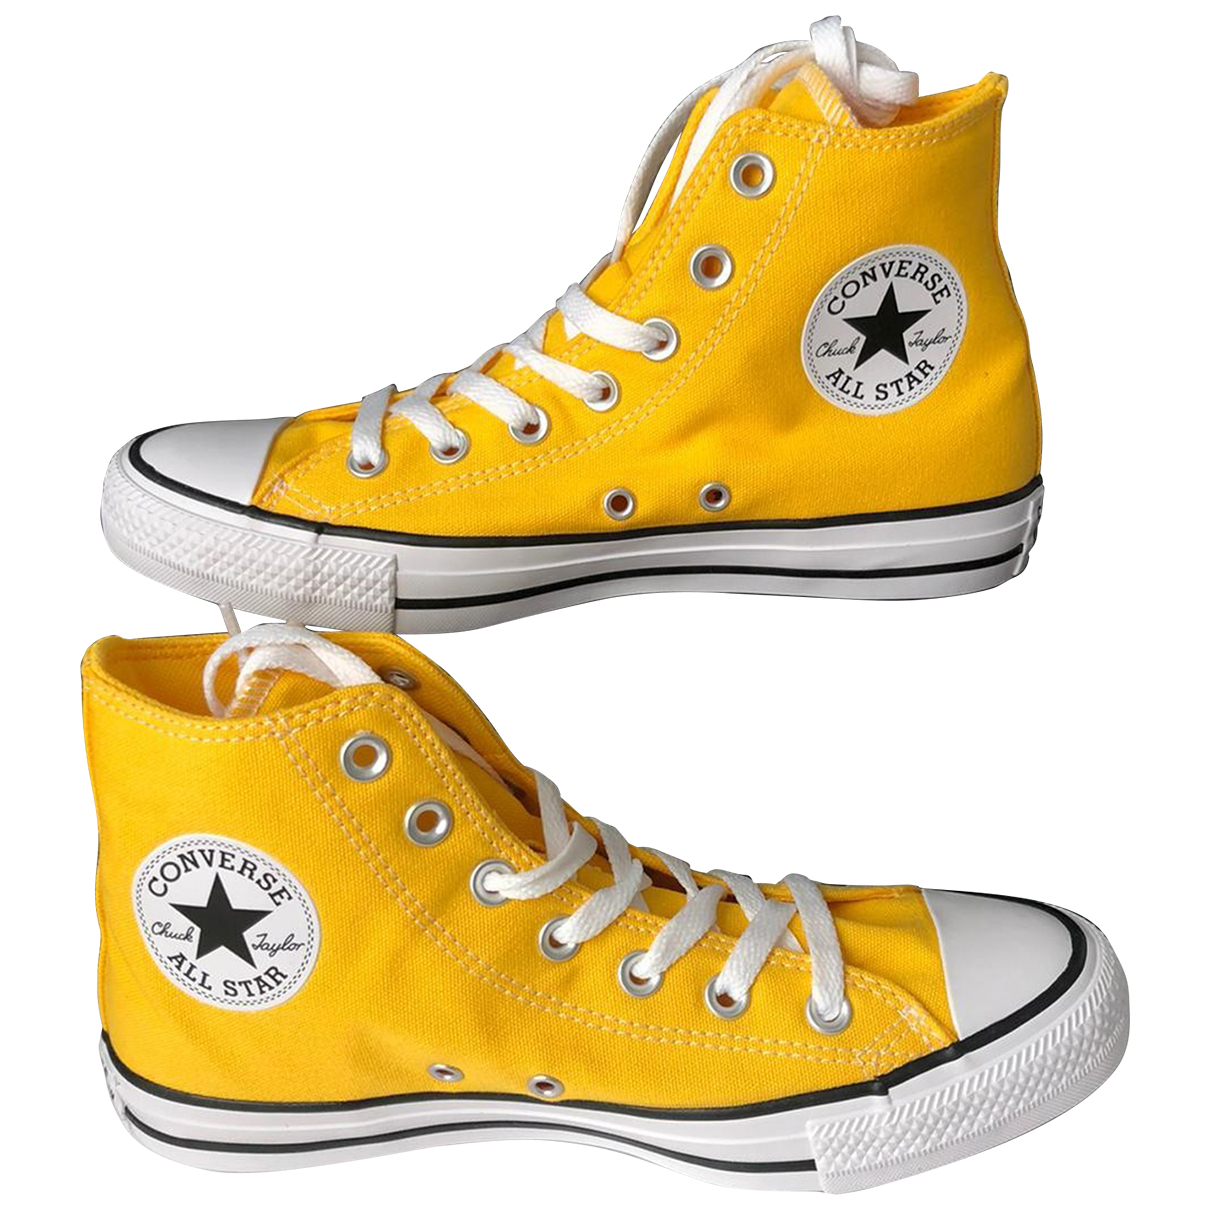 Converse N Yellow Cloth Trainers for Women 38 EU